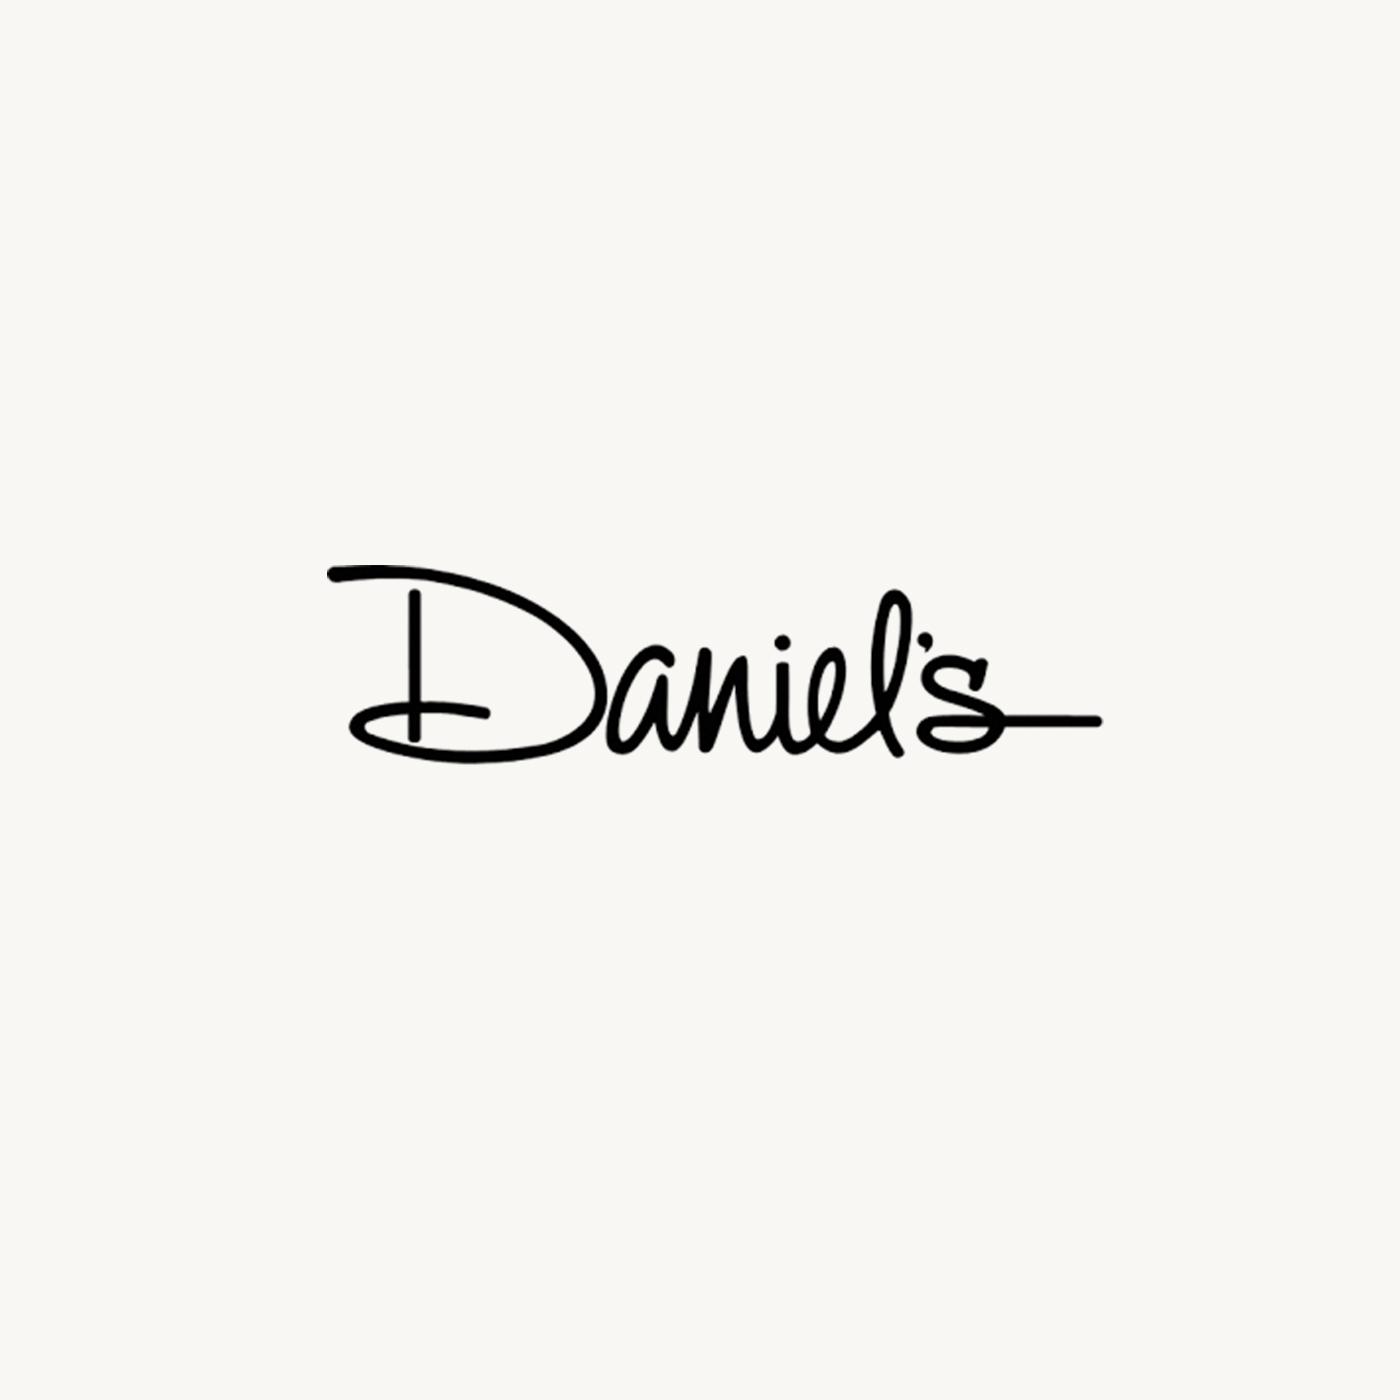 Daniels Jewelers Logo.jpg